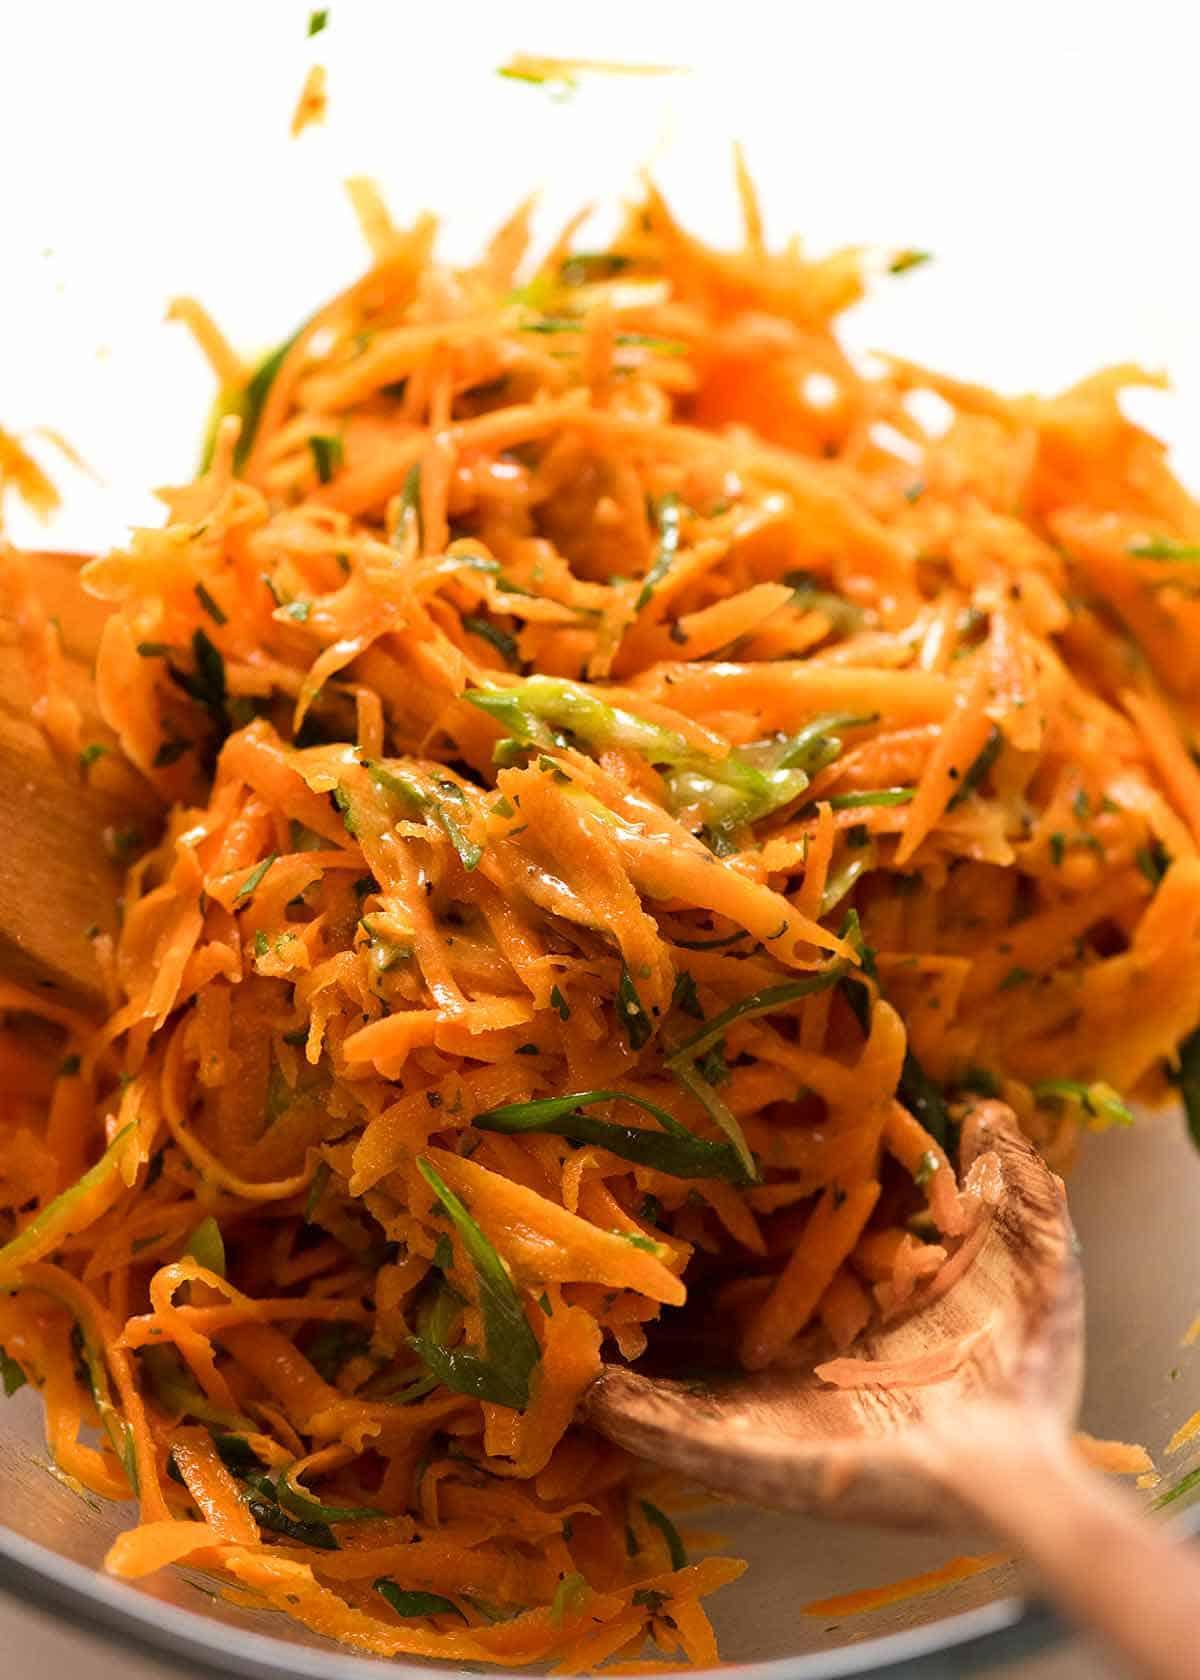 Close up of Carrot Salad with Honey Dijon Mustard Dressing